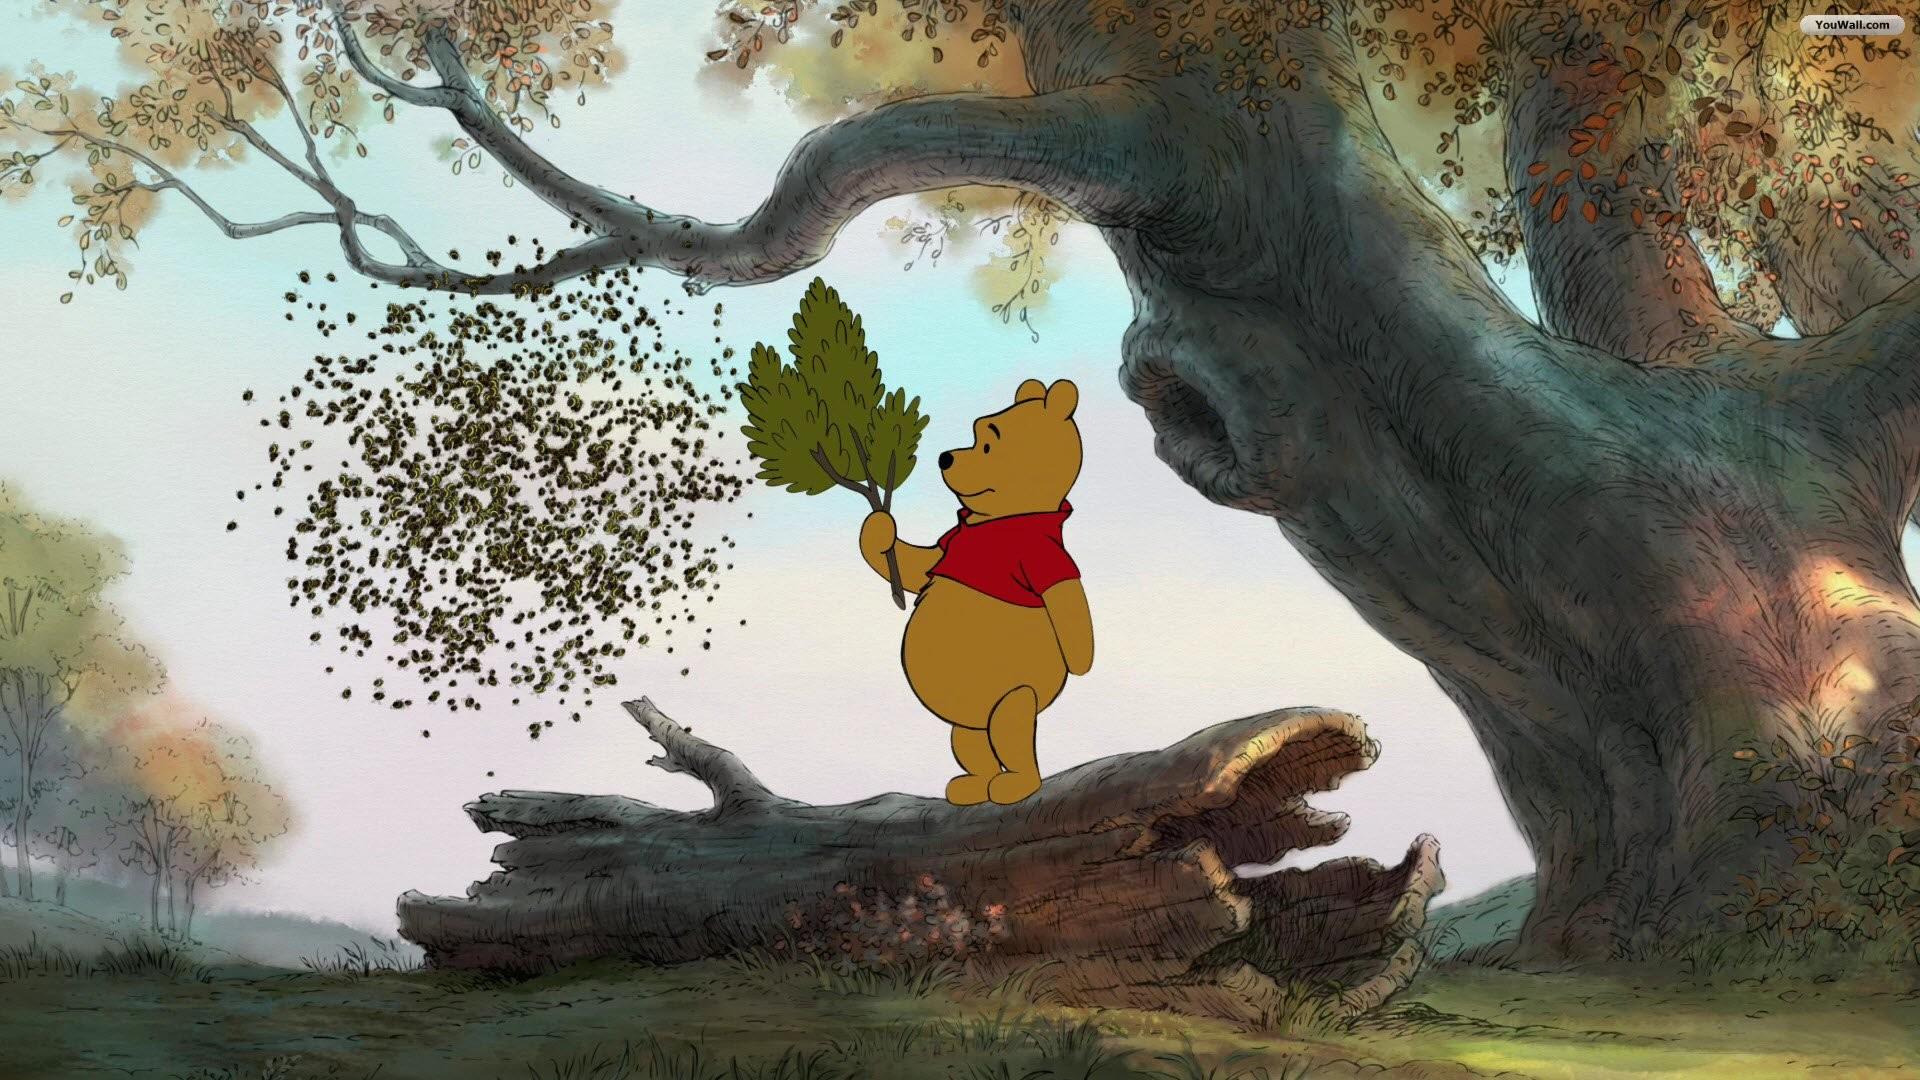 Winnie The Pooh Fall Desktop Wallpaper Pooh Bear Desktop Wallpaper 183 ① Wallpapertag